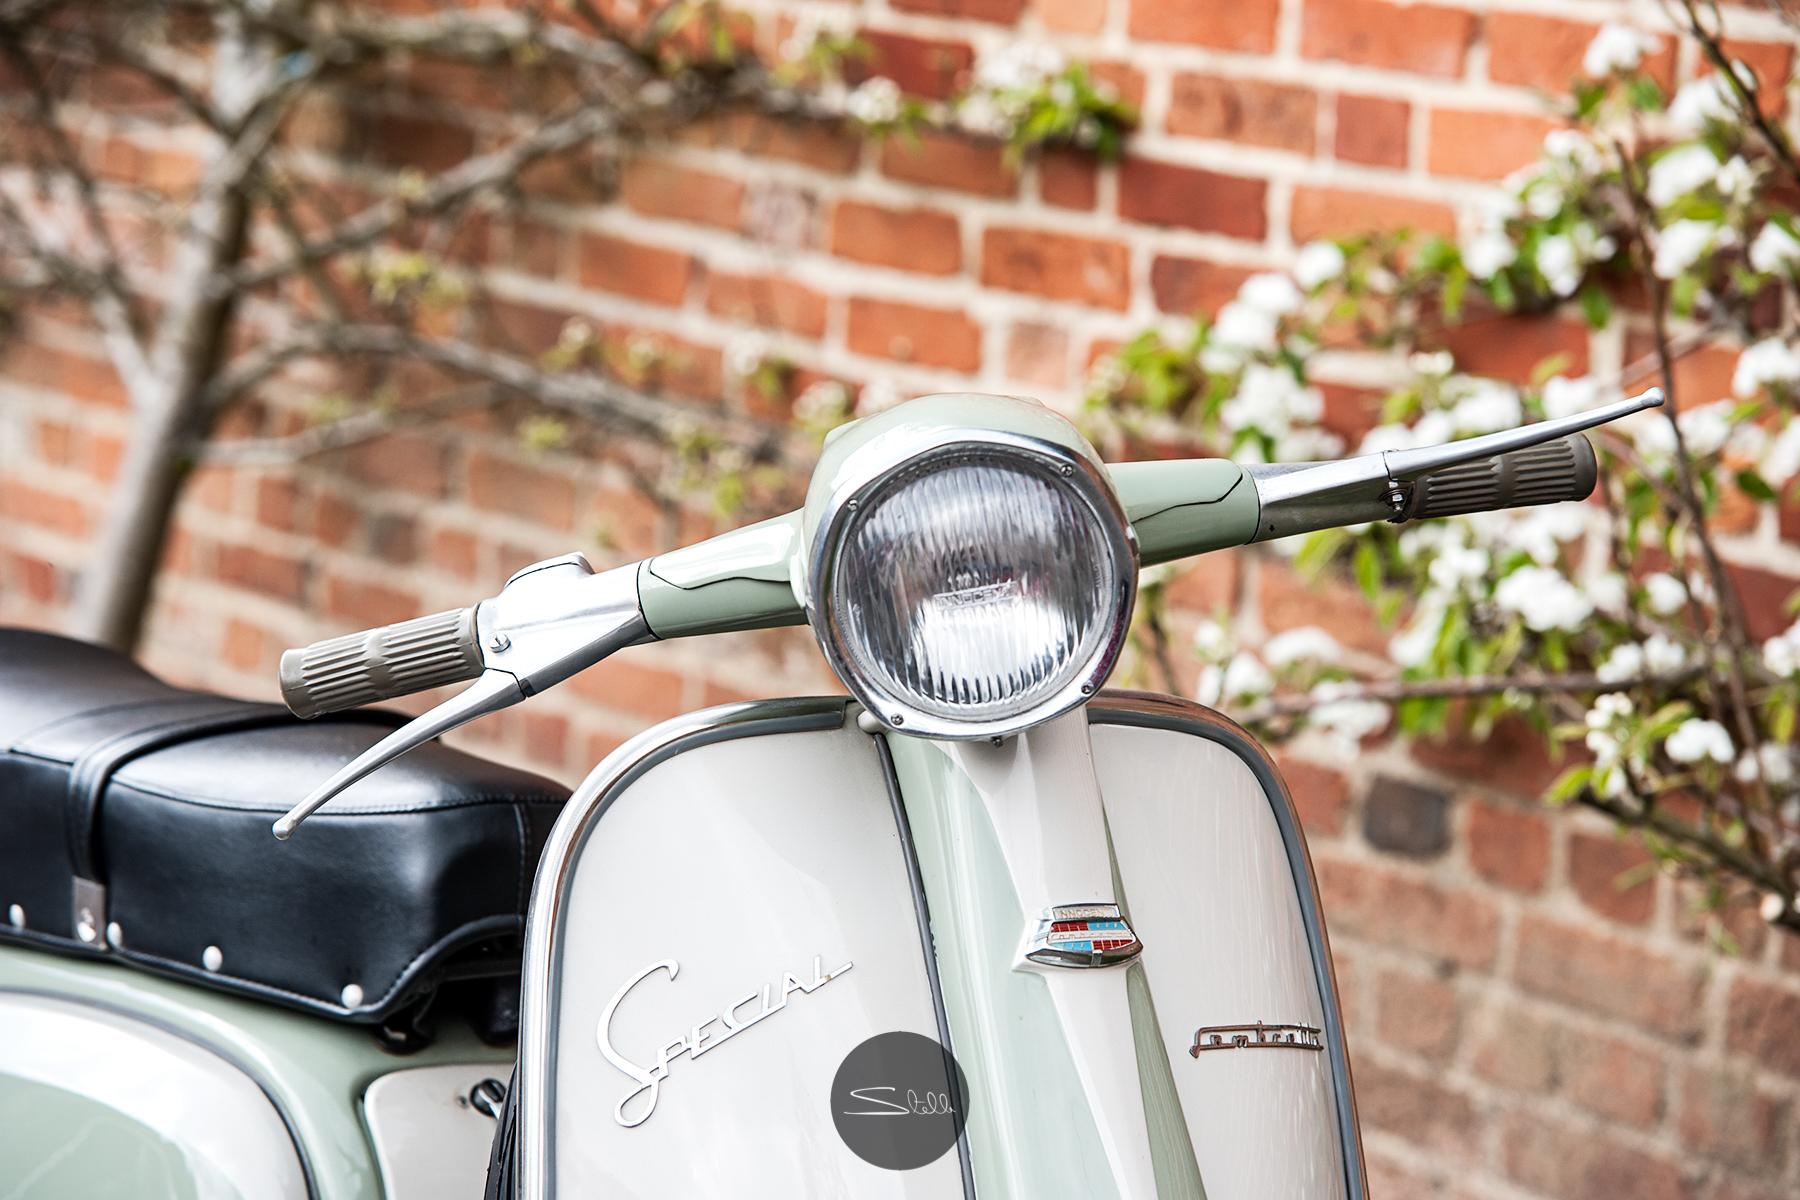 Stella Scordellis Lambretta Headlight Watermarked.jpg